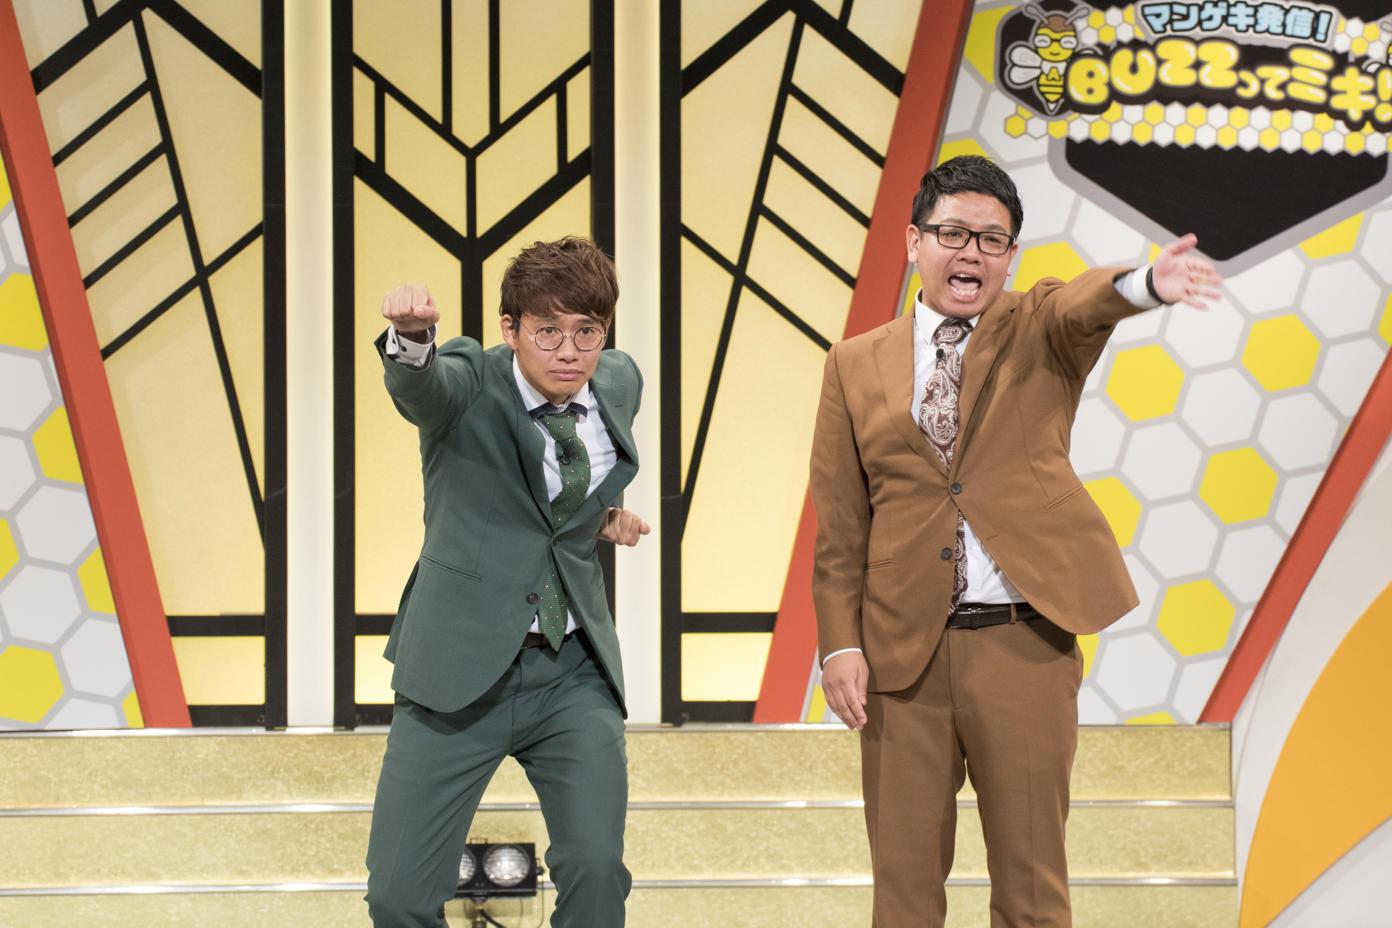 http://news.yoshimoto.co.jp/20170908065631-2c668f15c0d833398a1db6d830e586ab4c30ffae.jpg